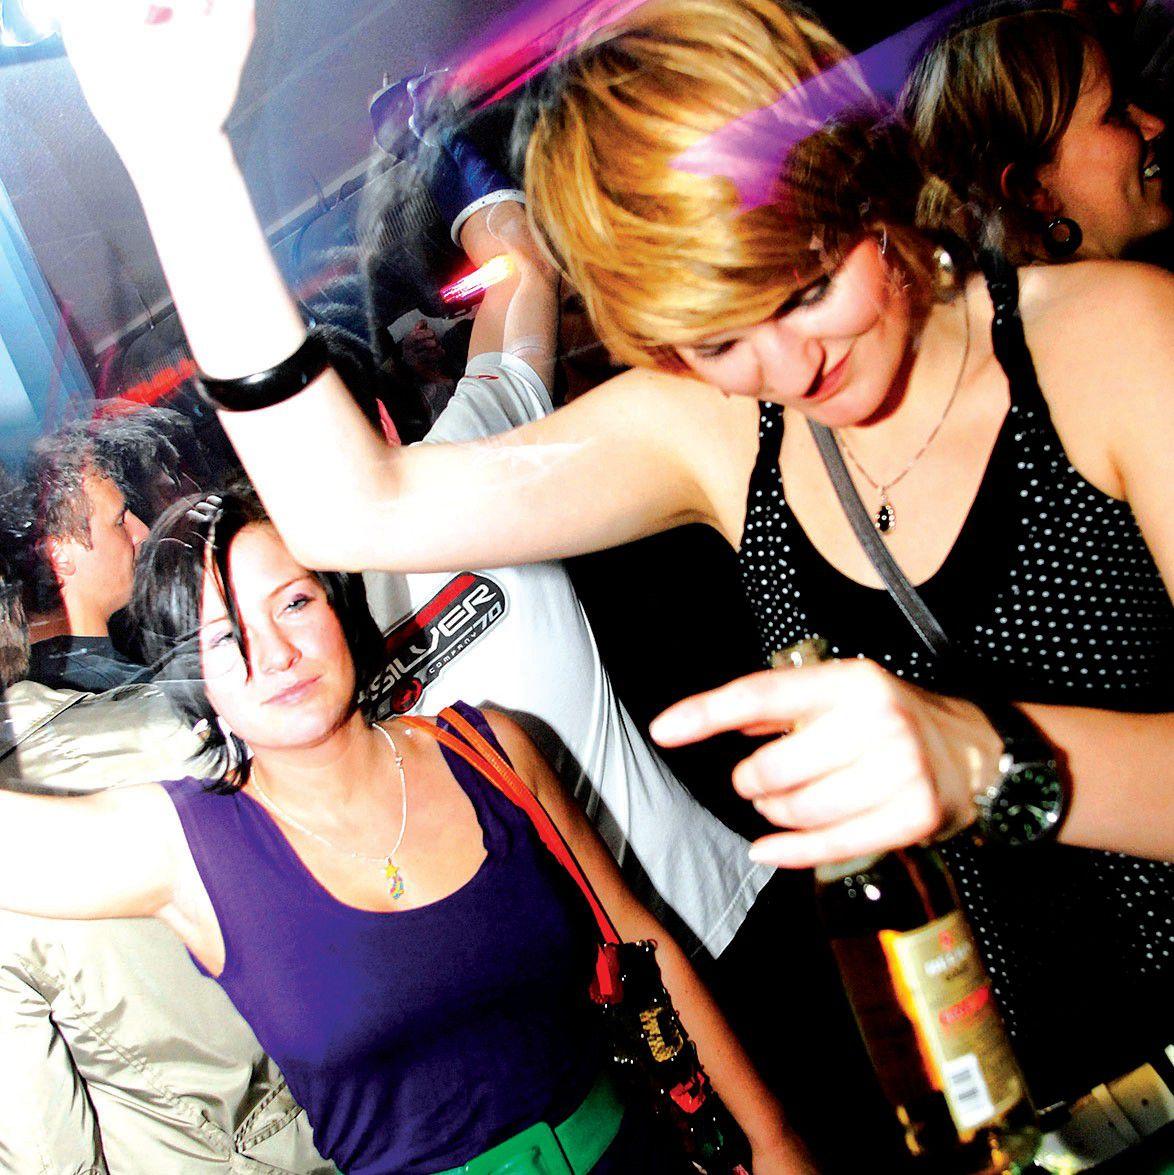 Clubs und Discos: Cafe Glocksee, Hannover   prinz.de